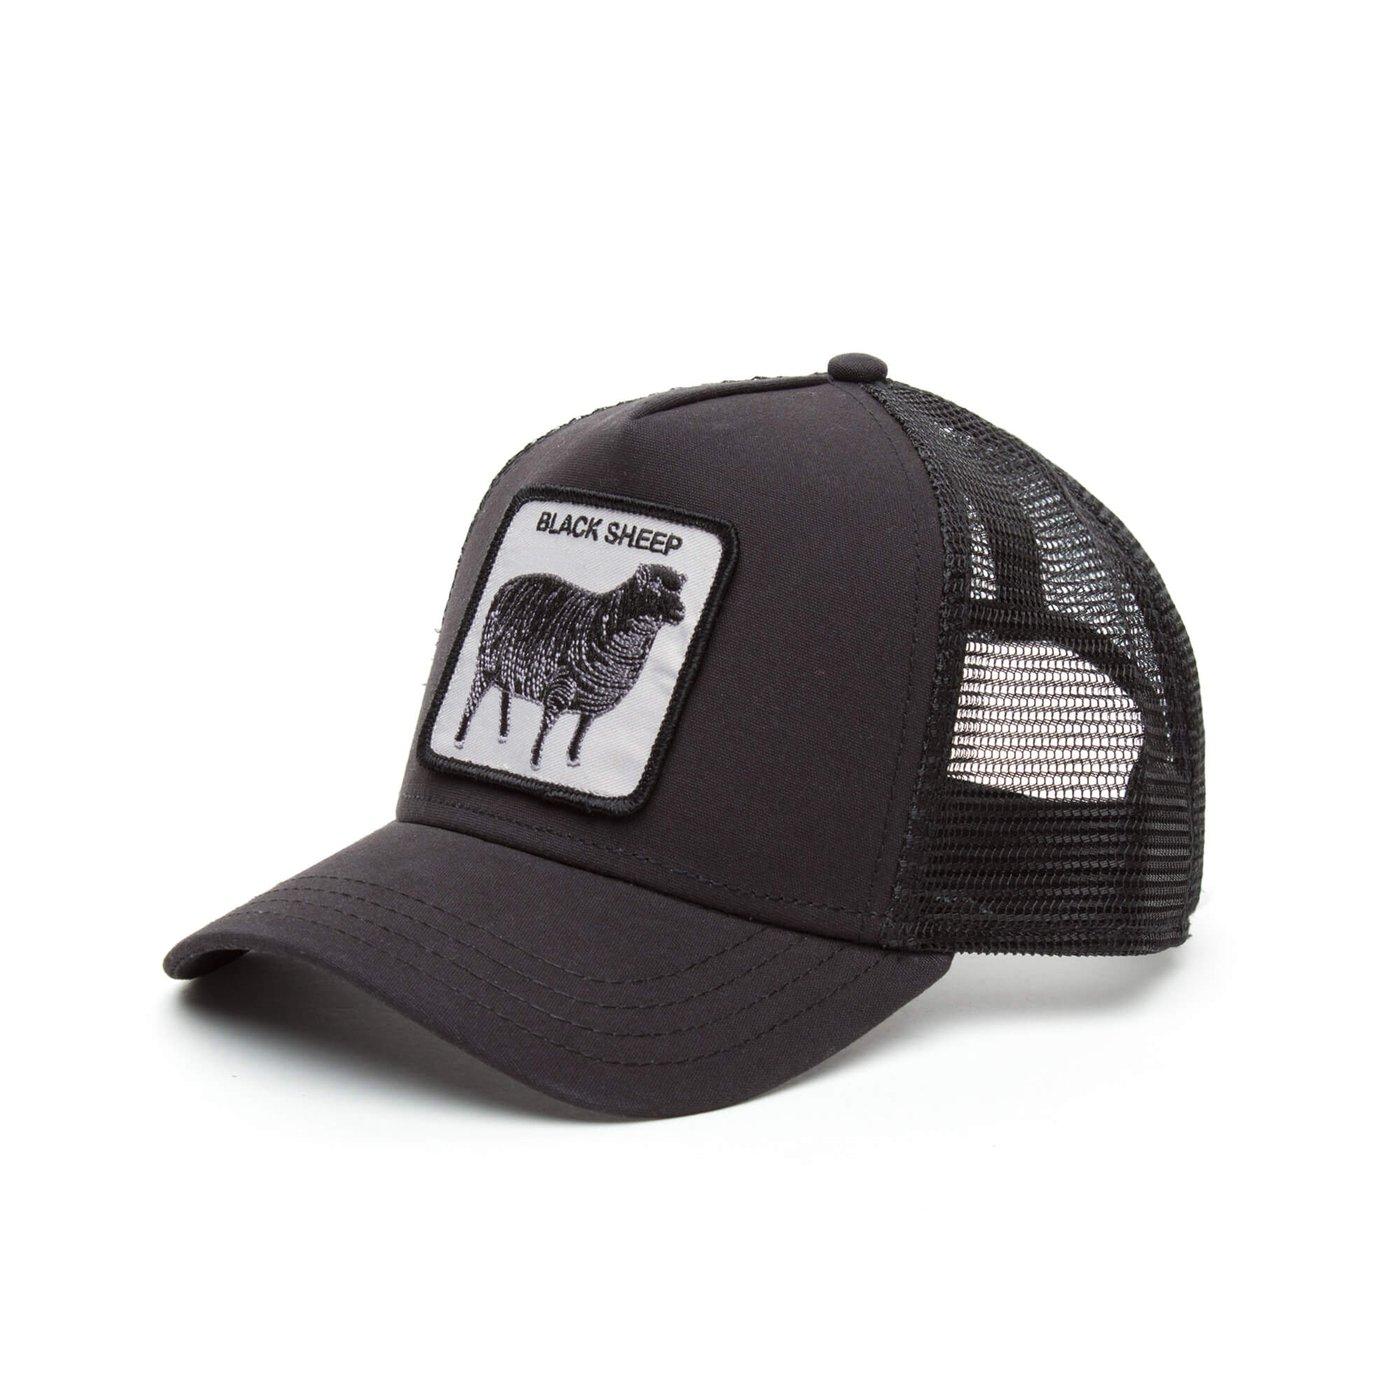 Goorin Bros Naughty Lamb Unisex Siyah Şapka